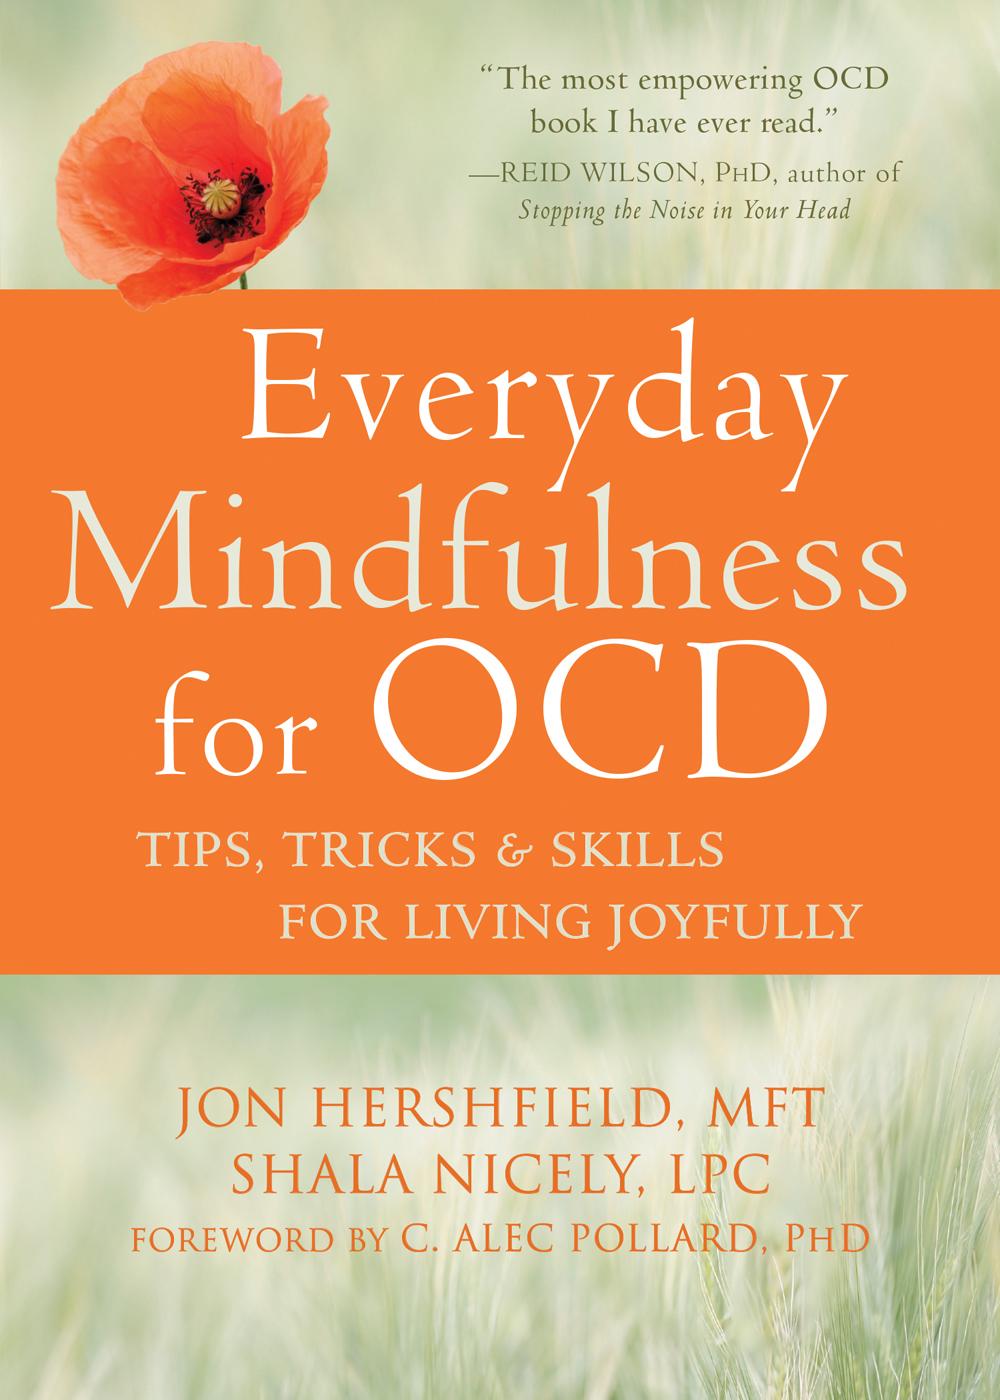 Everyday Mindfulness for OCD Tips, Tricks, and Skills for Living Joyfully